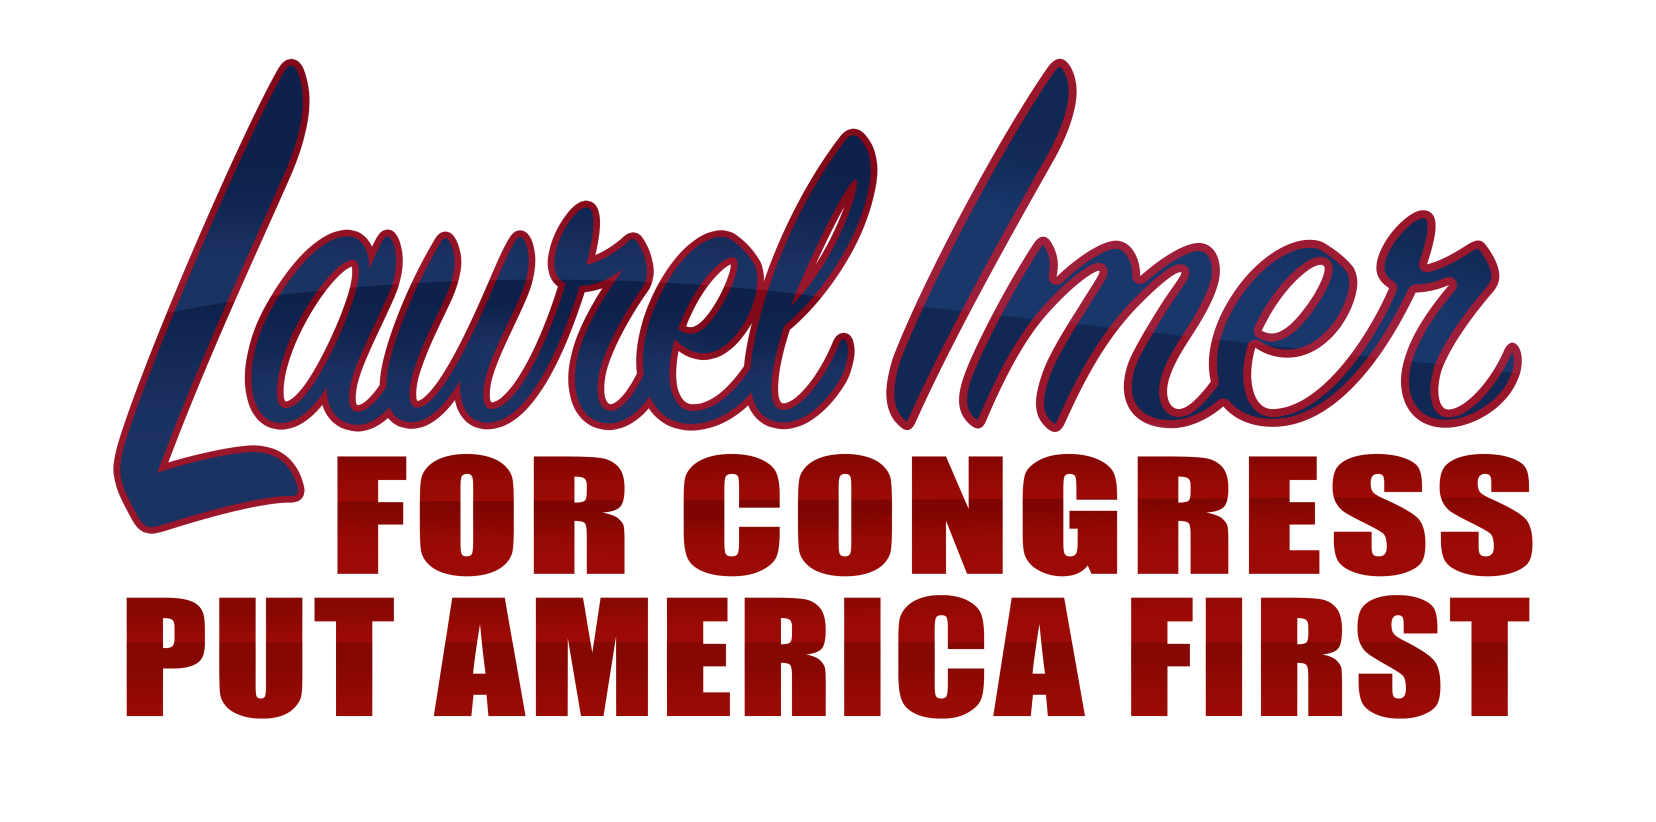 Laurel imer for congress paf winred